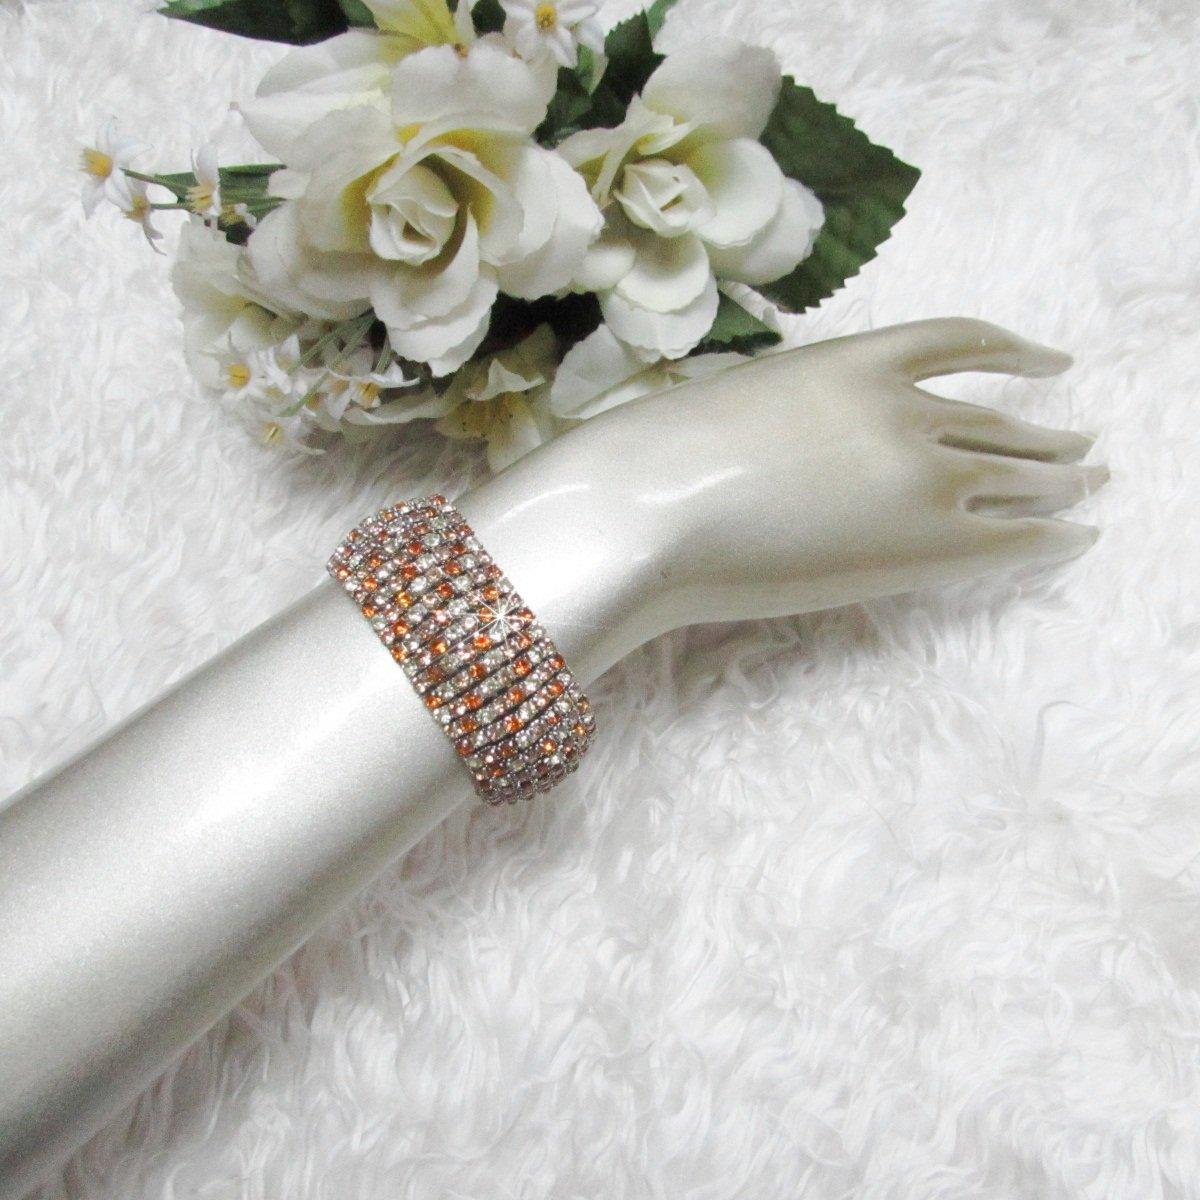 Sparkling Stretch Rhinestone Prom Wedding Pageant Bridal Bracelet cone woman accessories cb10